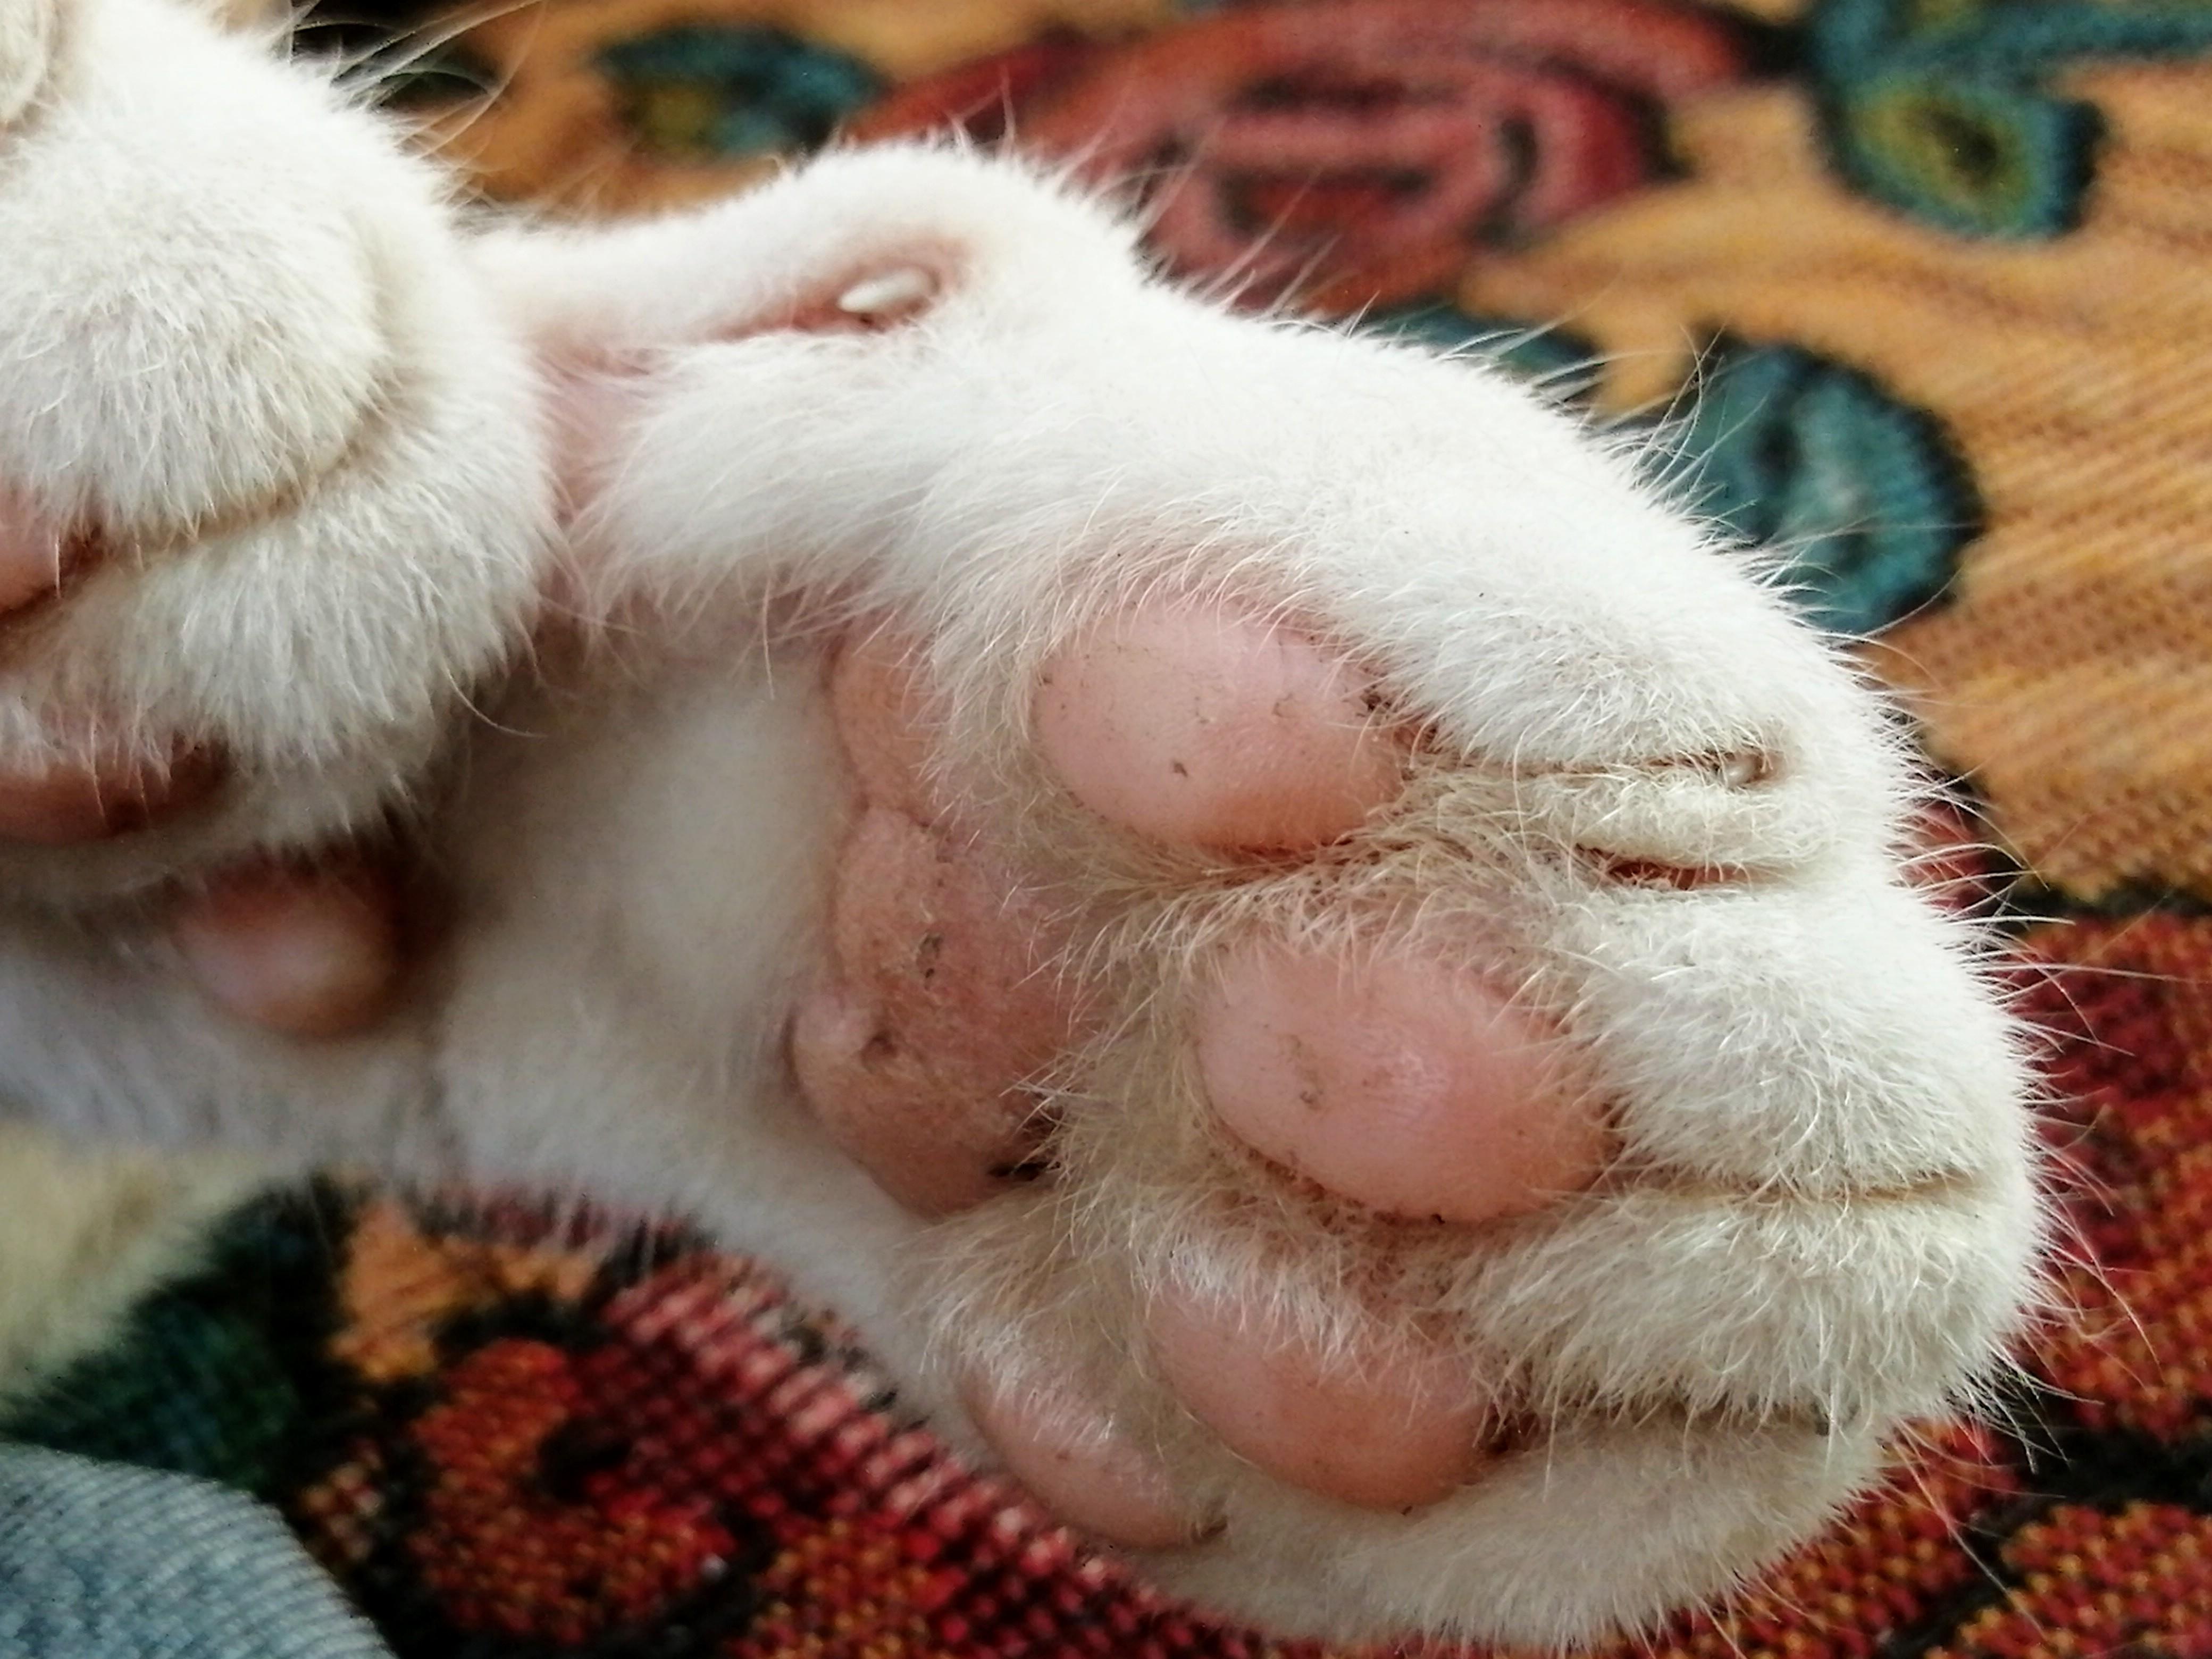 velká kočička zdarmatori černé nohy porno